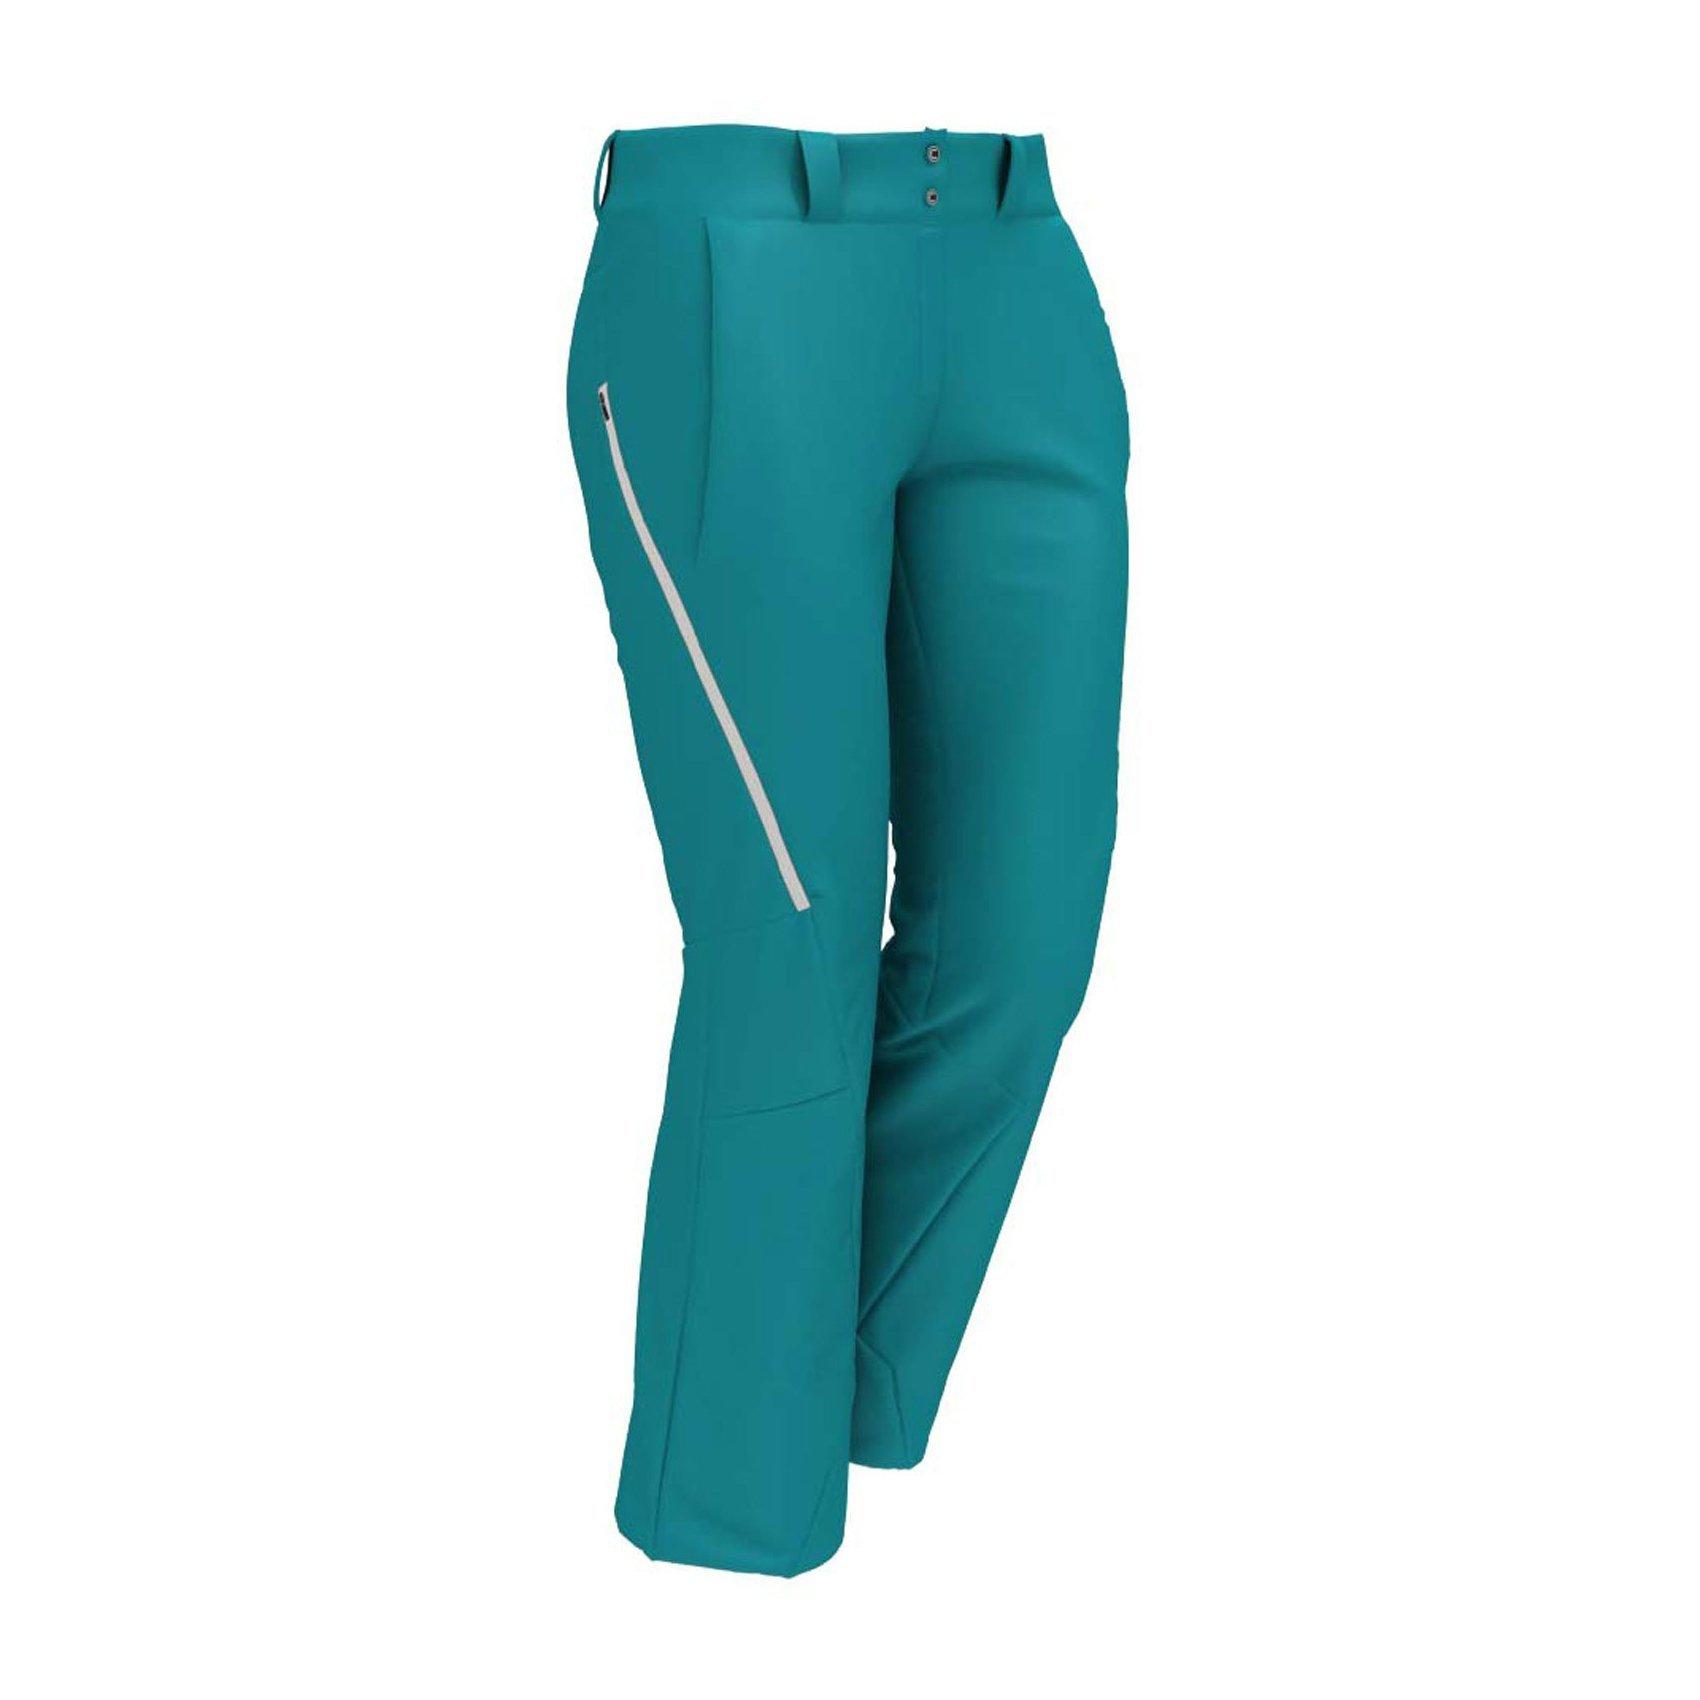 Dámske lyžiarske nohavice - Actisport.sk d3a520fab5